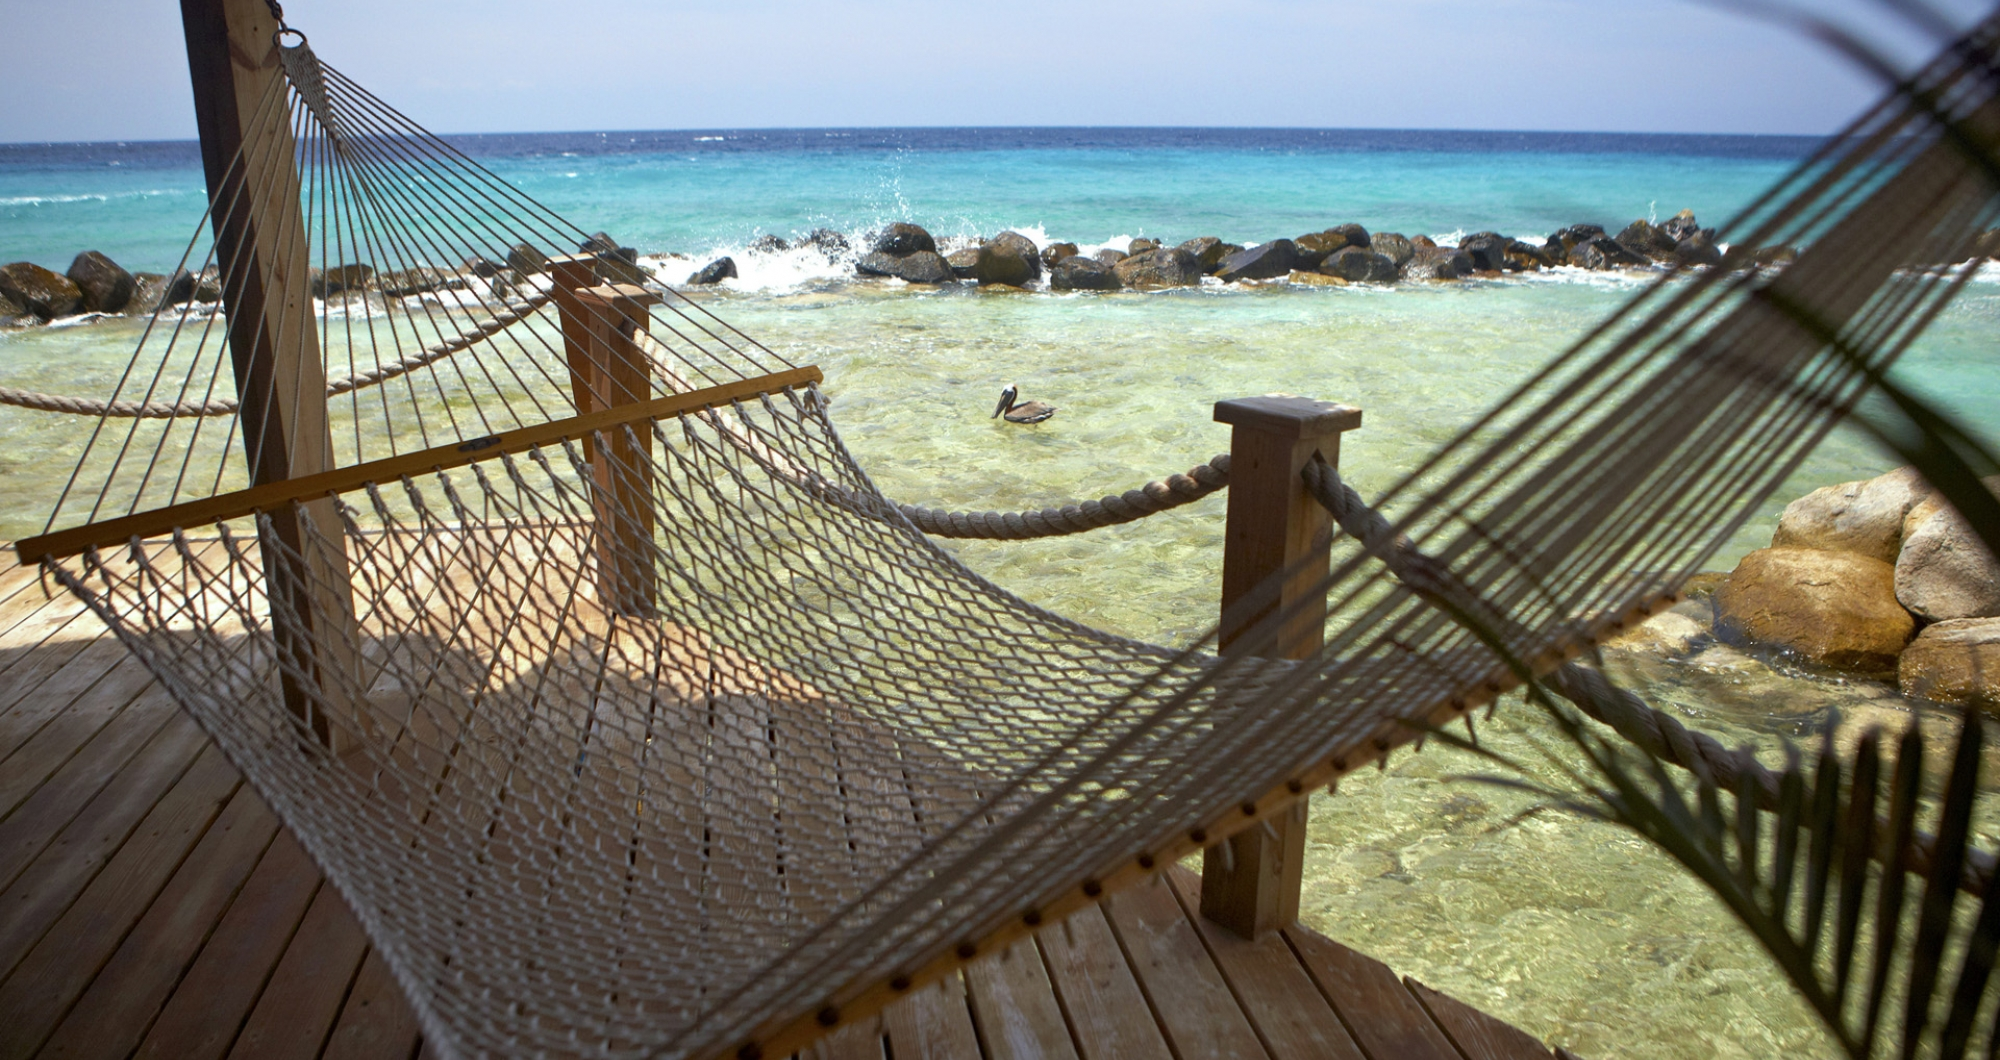 Aruba_oranjestad_destination_hamak_aruba_beach